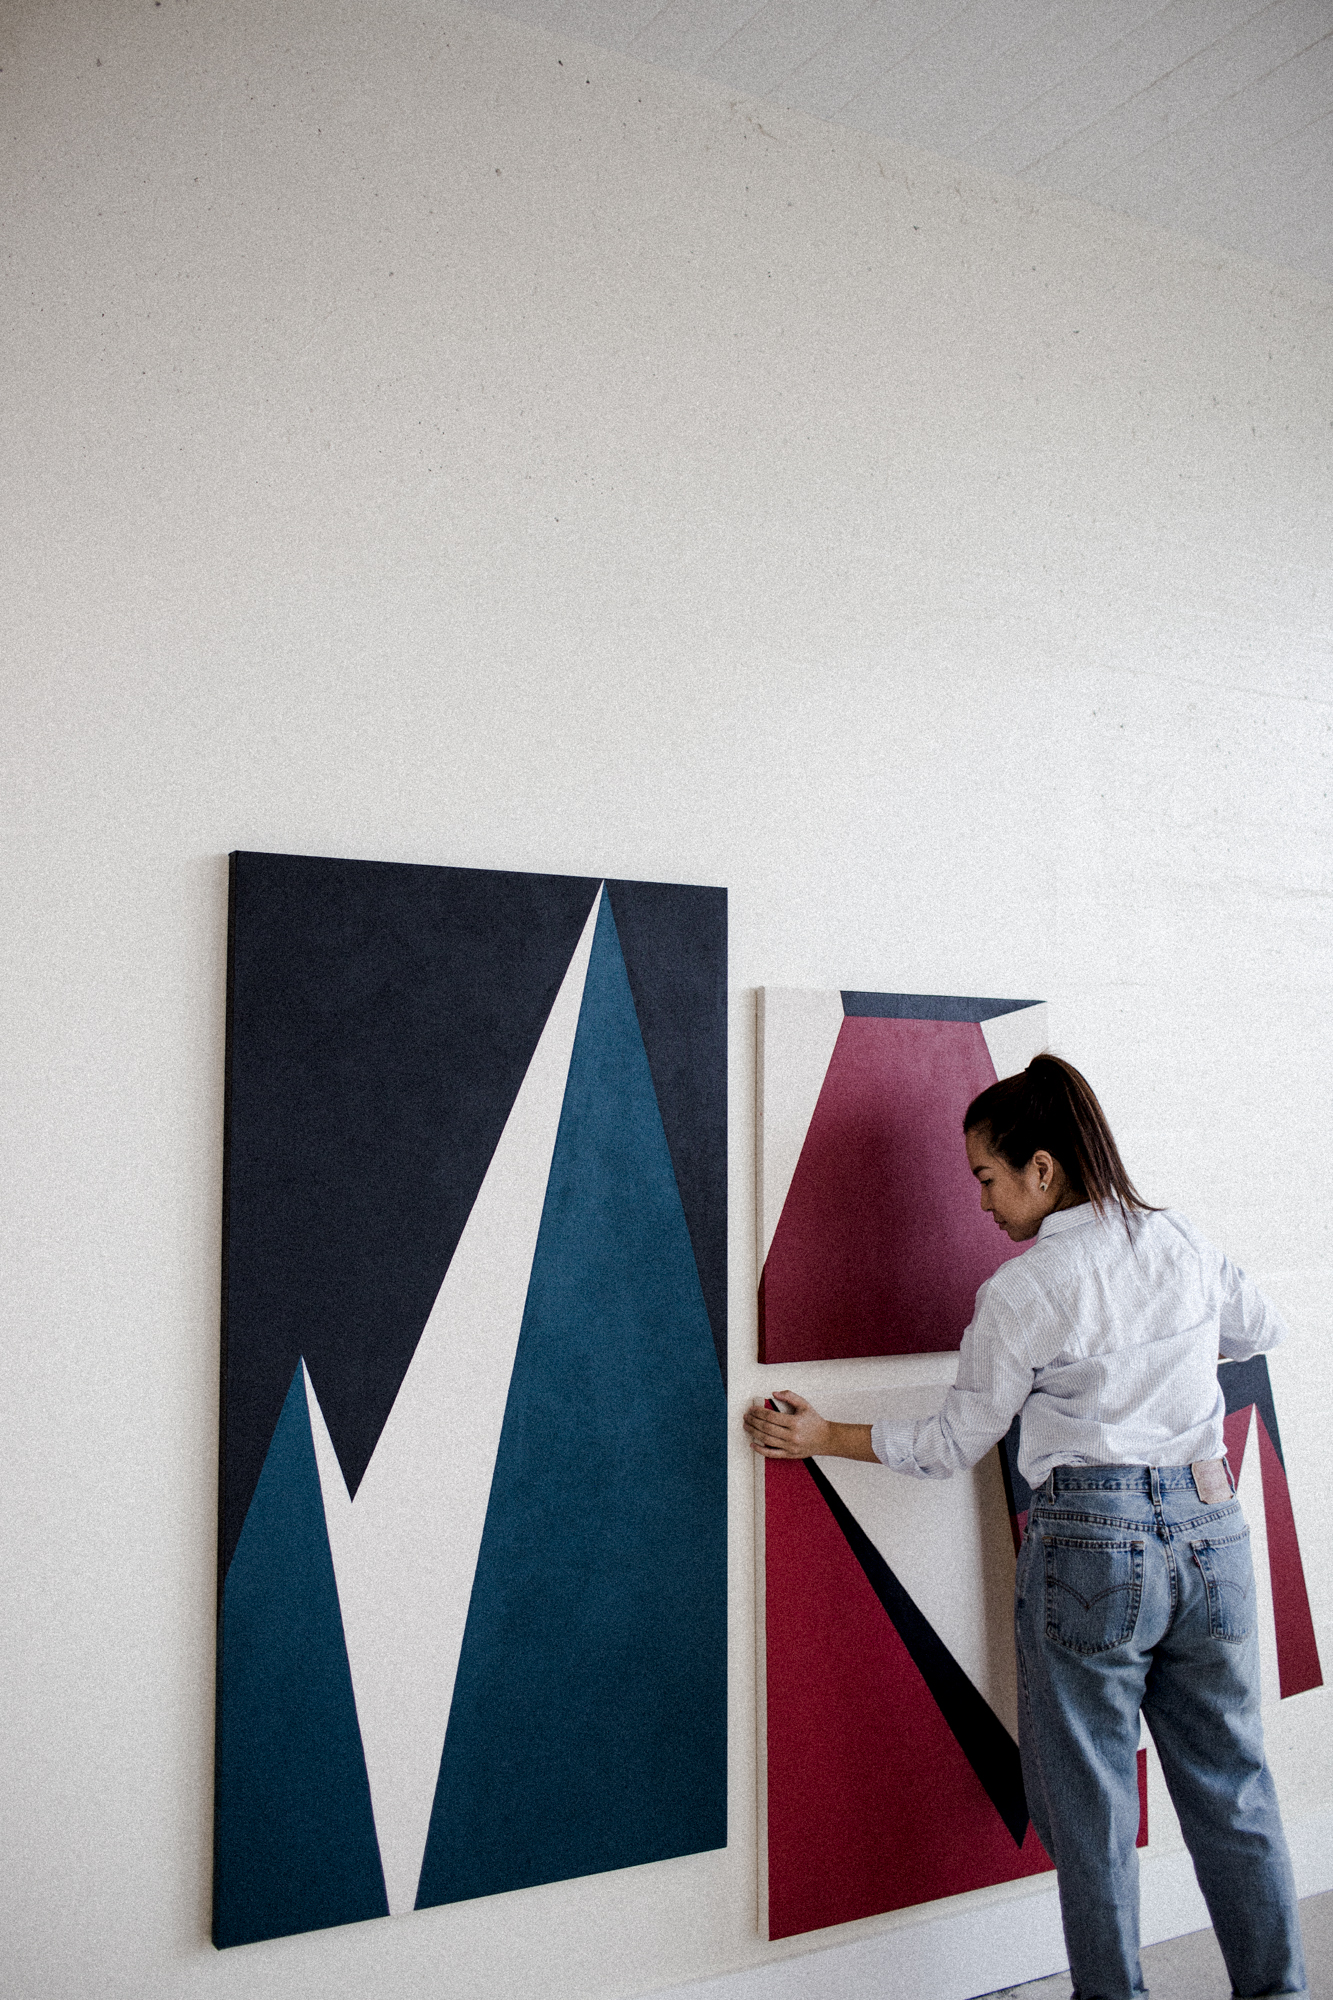 Spring 2019 Emerging Art Prize winner Hyun Jung Ahn